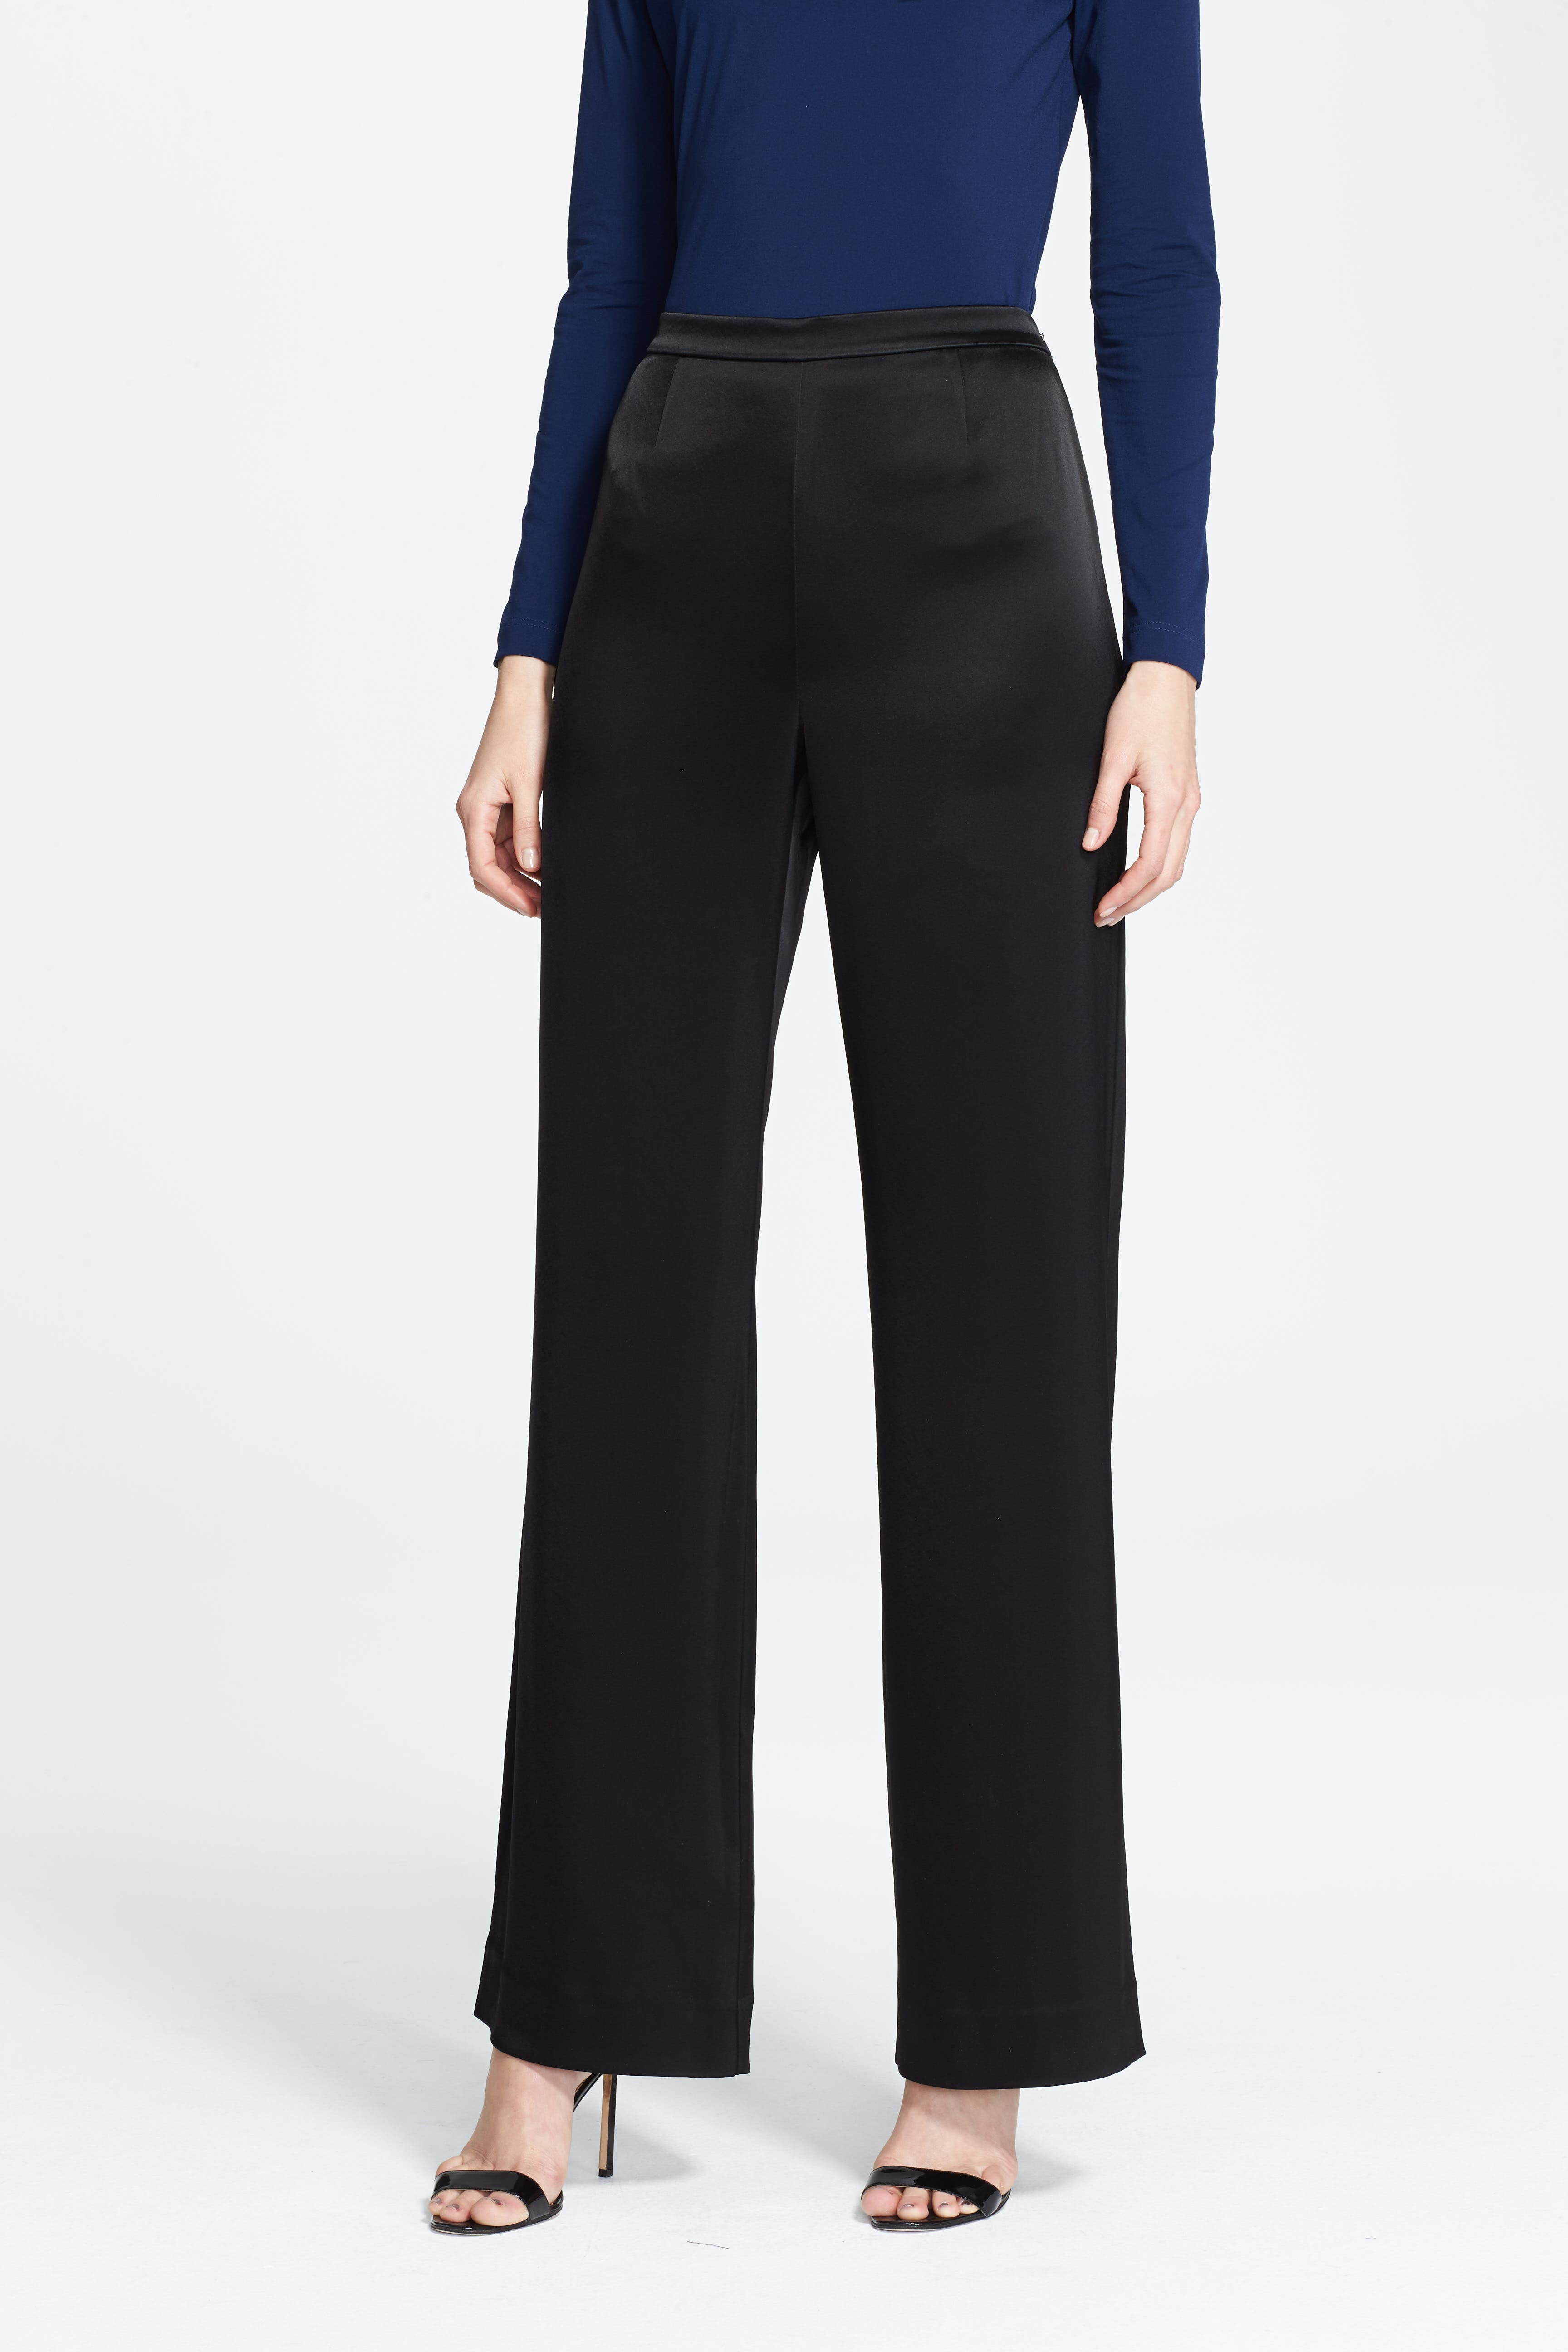 Women's St. John Collection 'Kate' Liquid Satin Pants